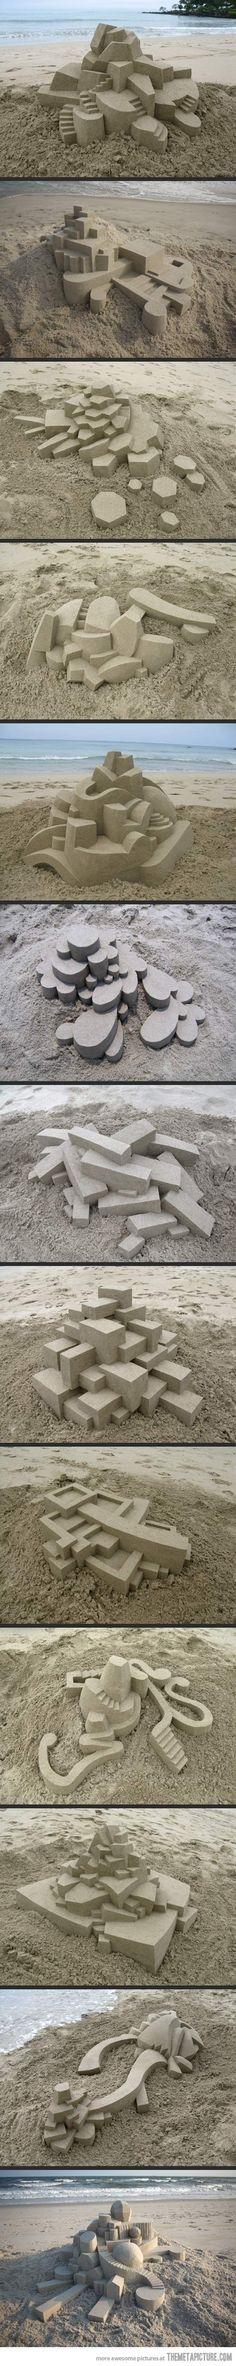 Geometrically Perfect Sand Castles…